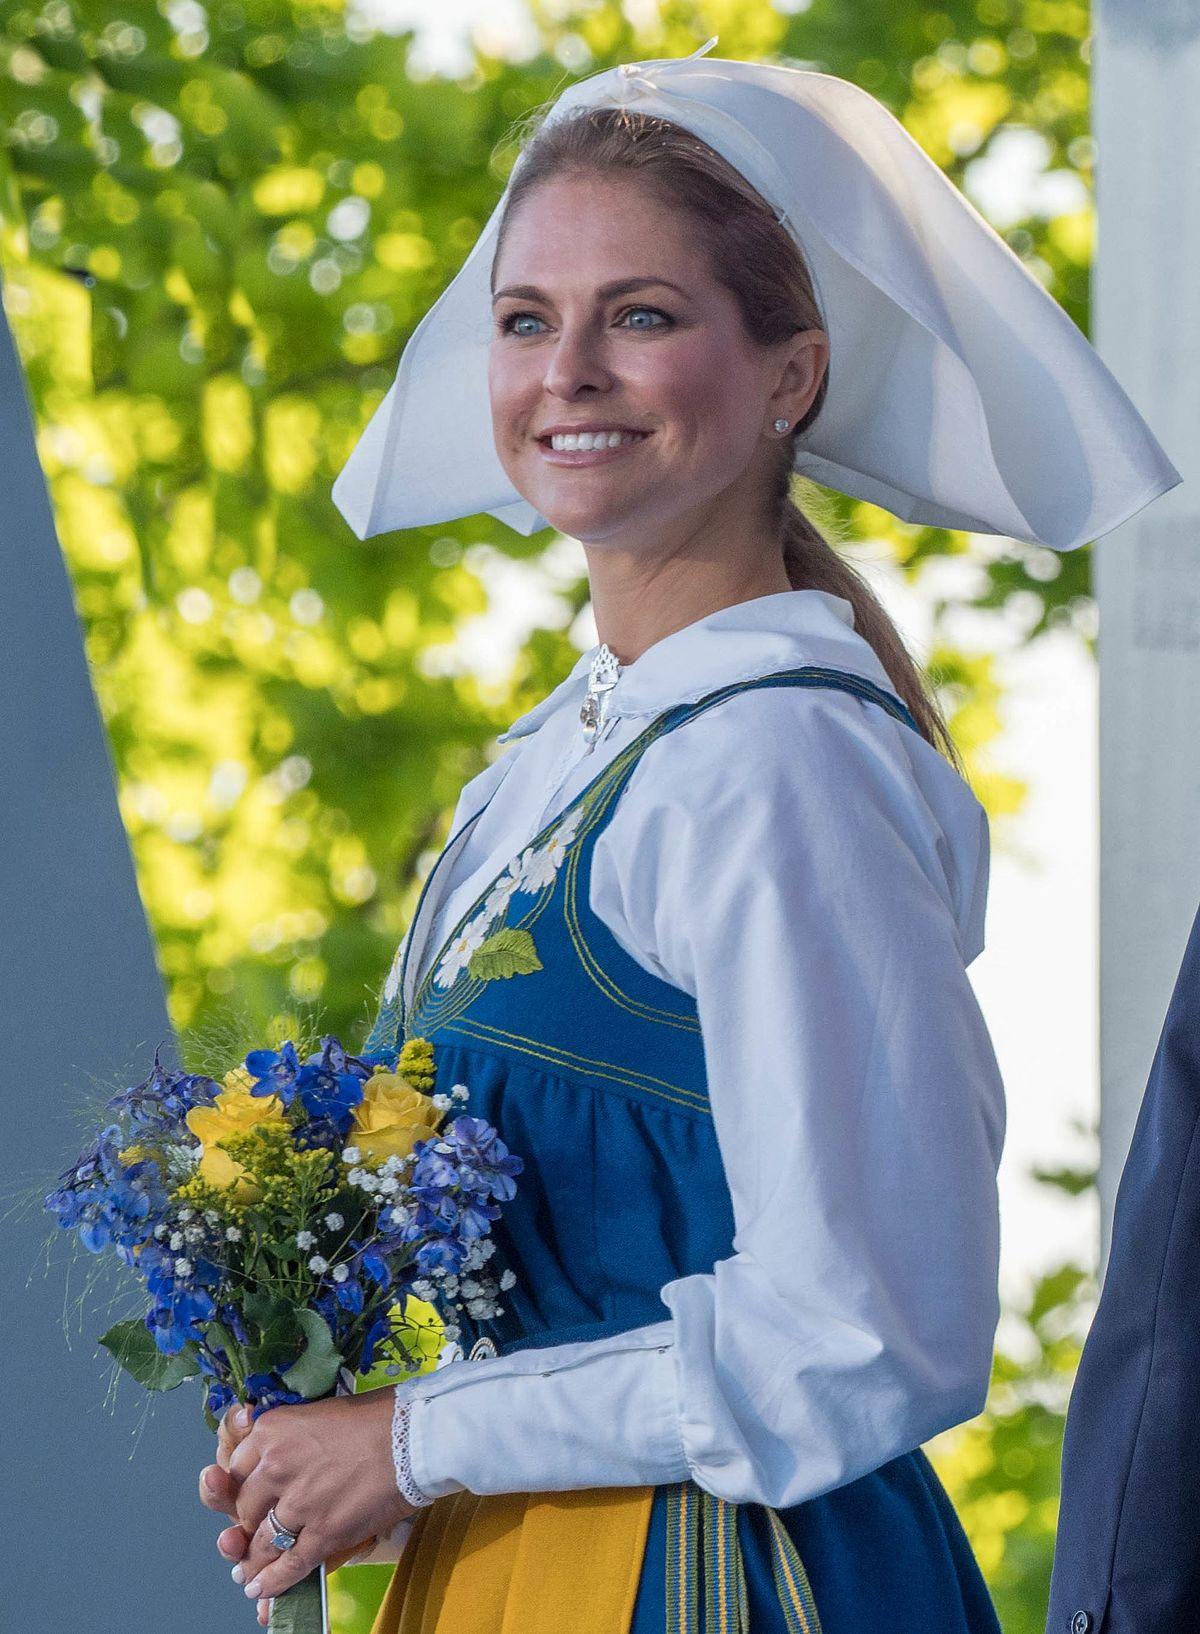 Princess Madeleine Duchess Of Hälsingland And Gästrikland